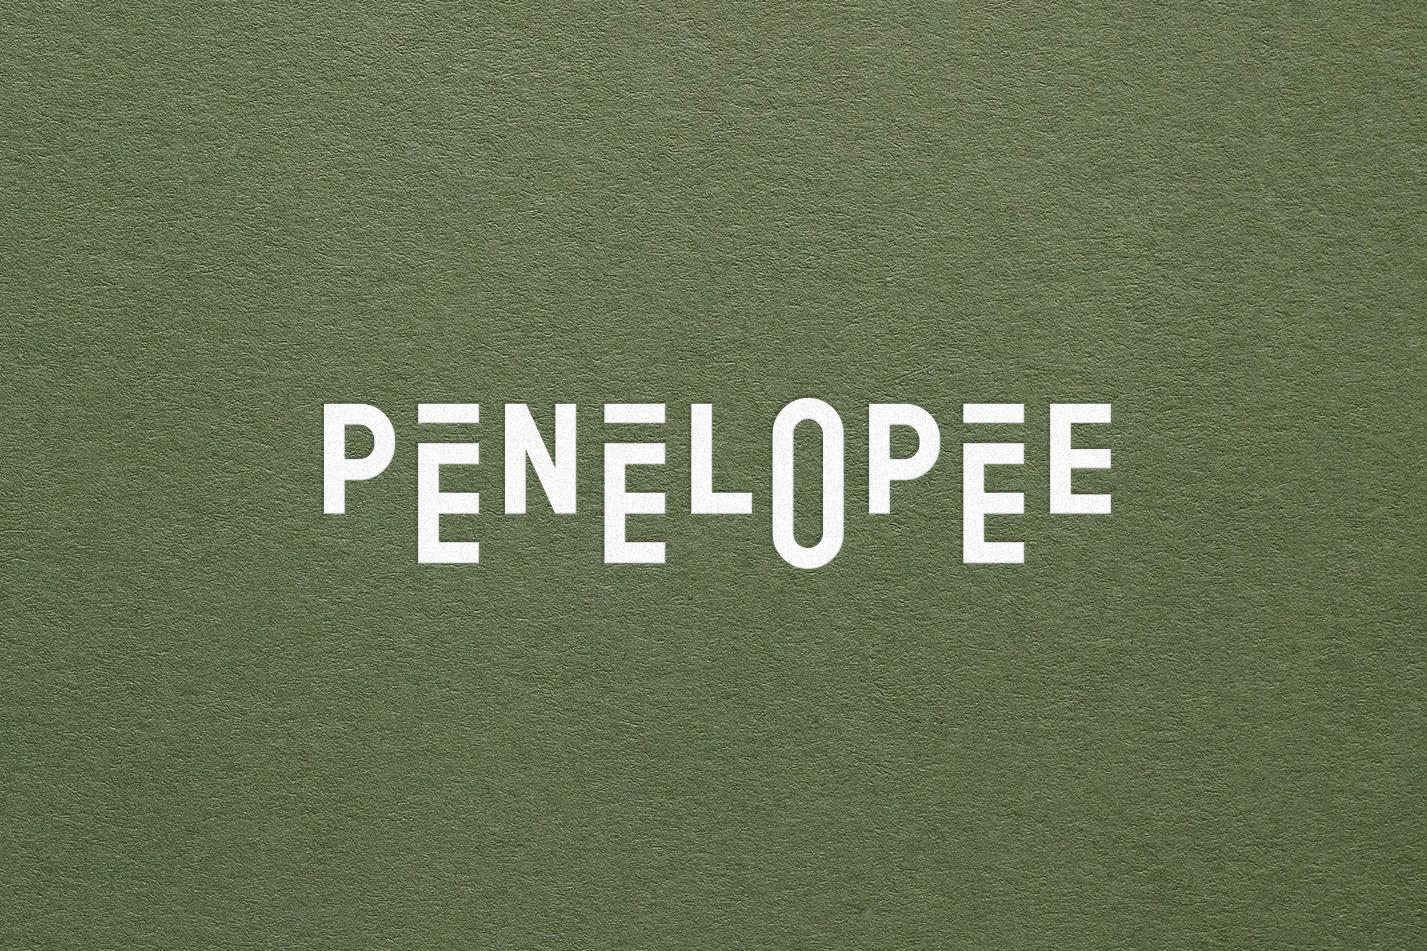 bureaucime-paris-penelopee-04